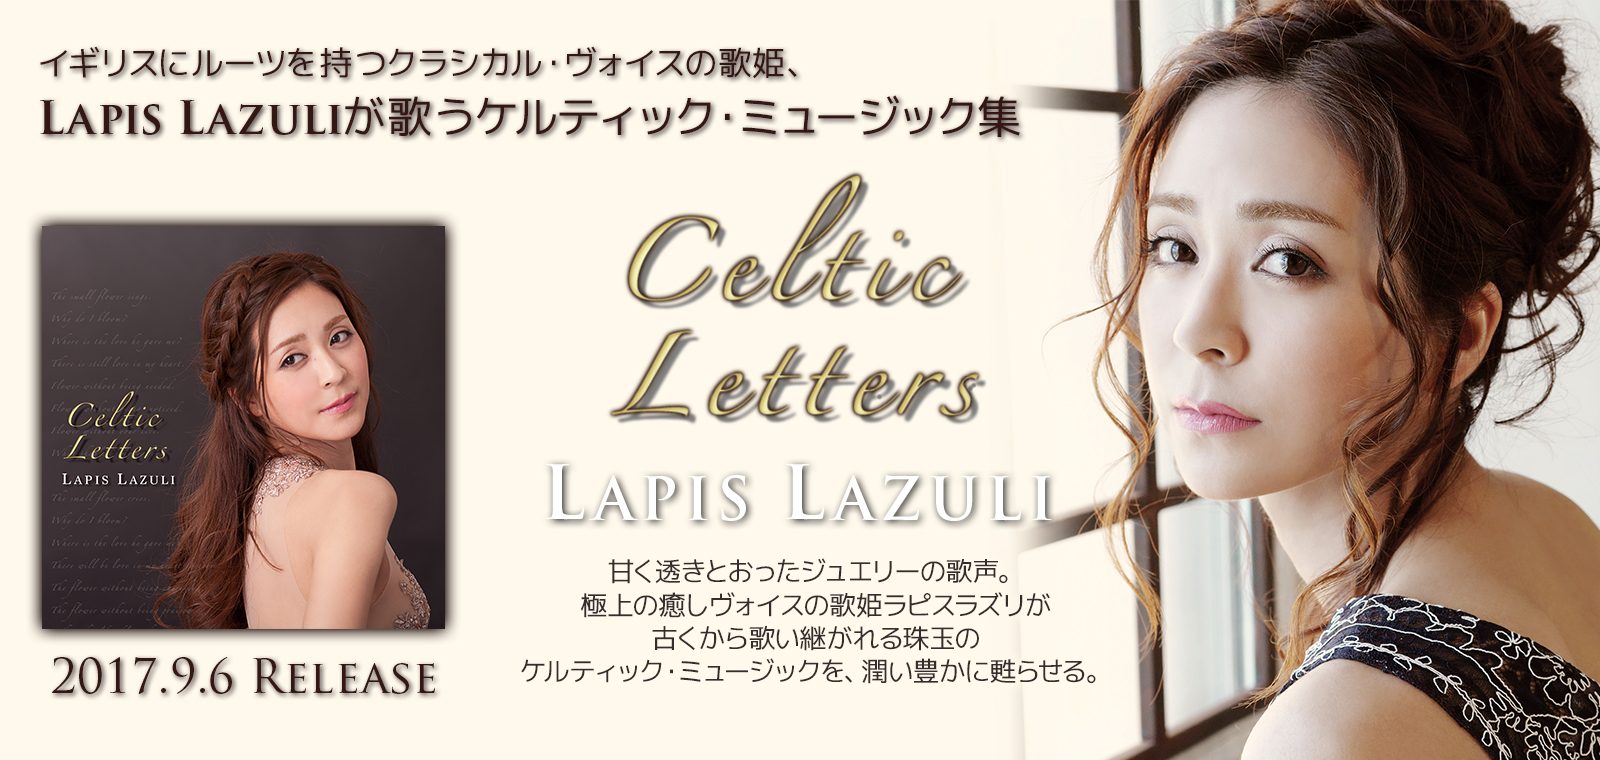 Lapis Lazuli(ラピスラズリ)Nostalgia